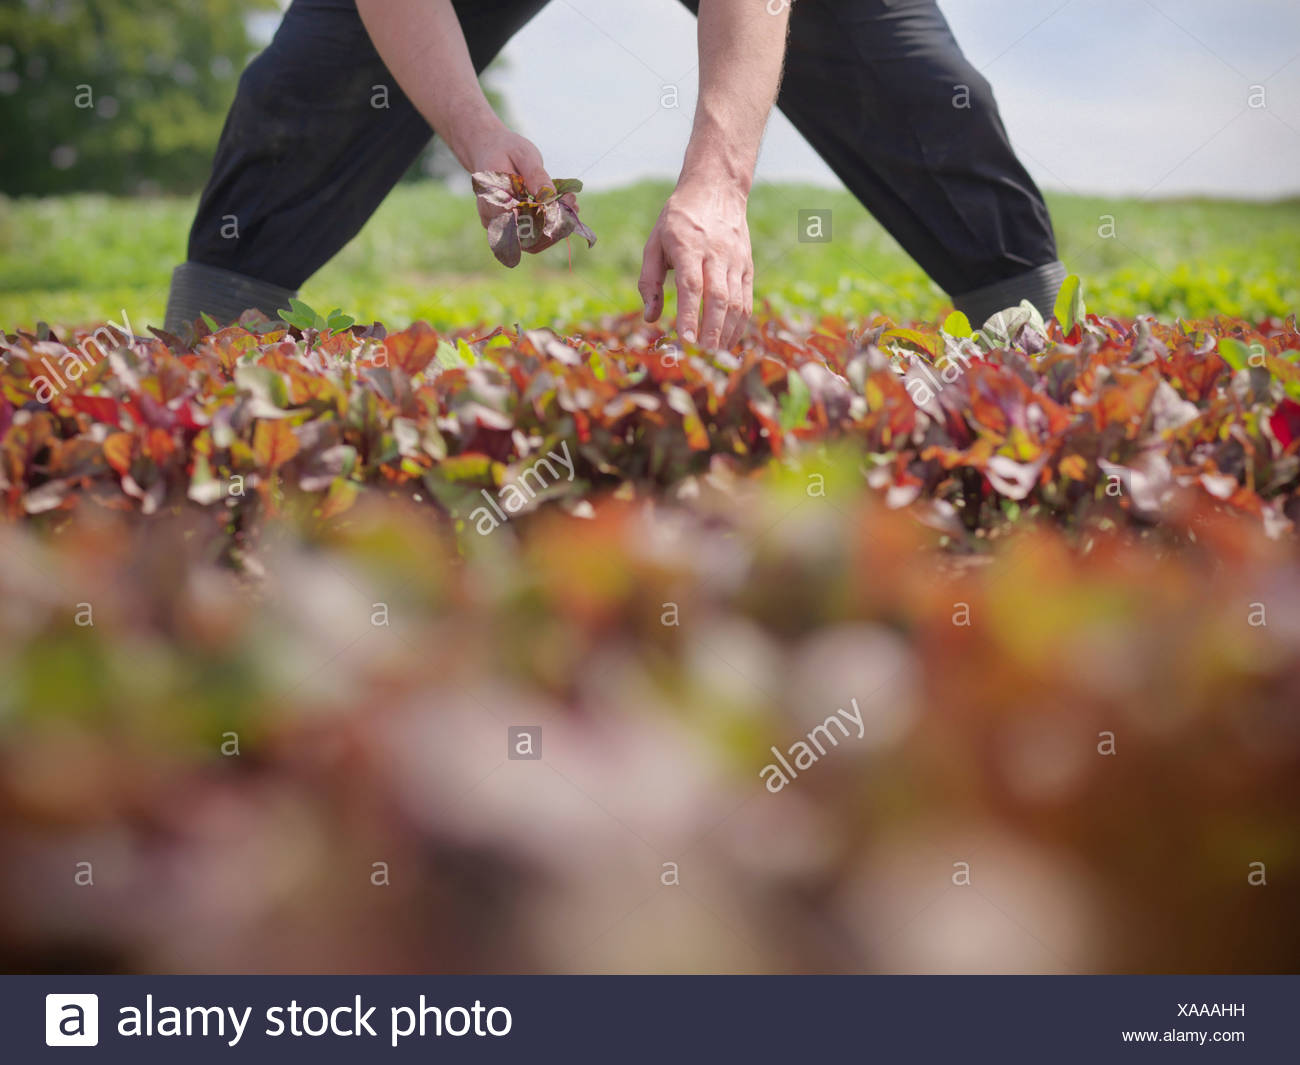 Man Picking Lettuce Stock Photos & Man Picking Lettuce Stock Images ...